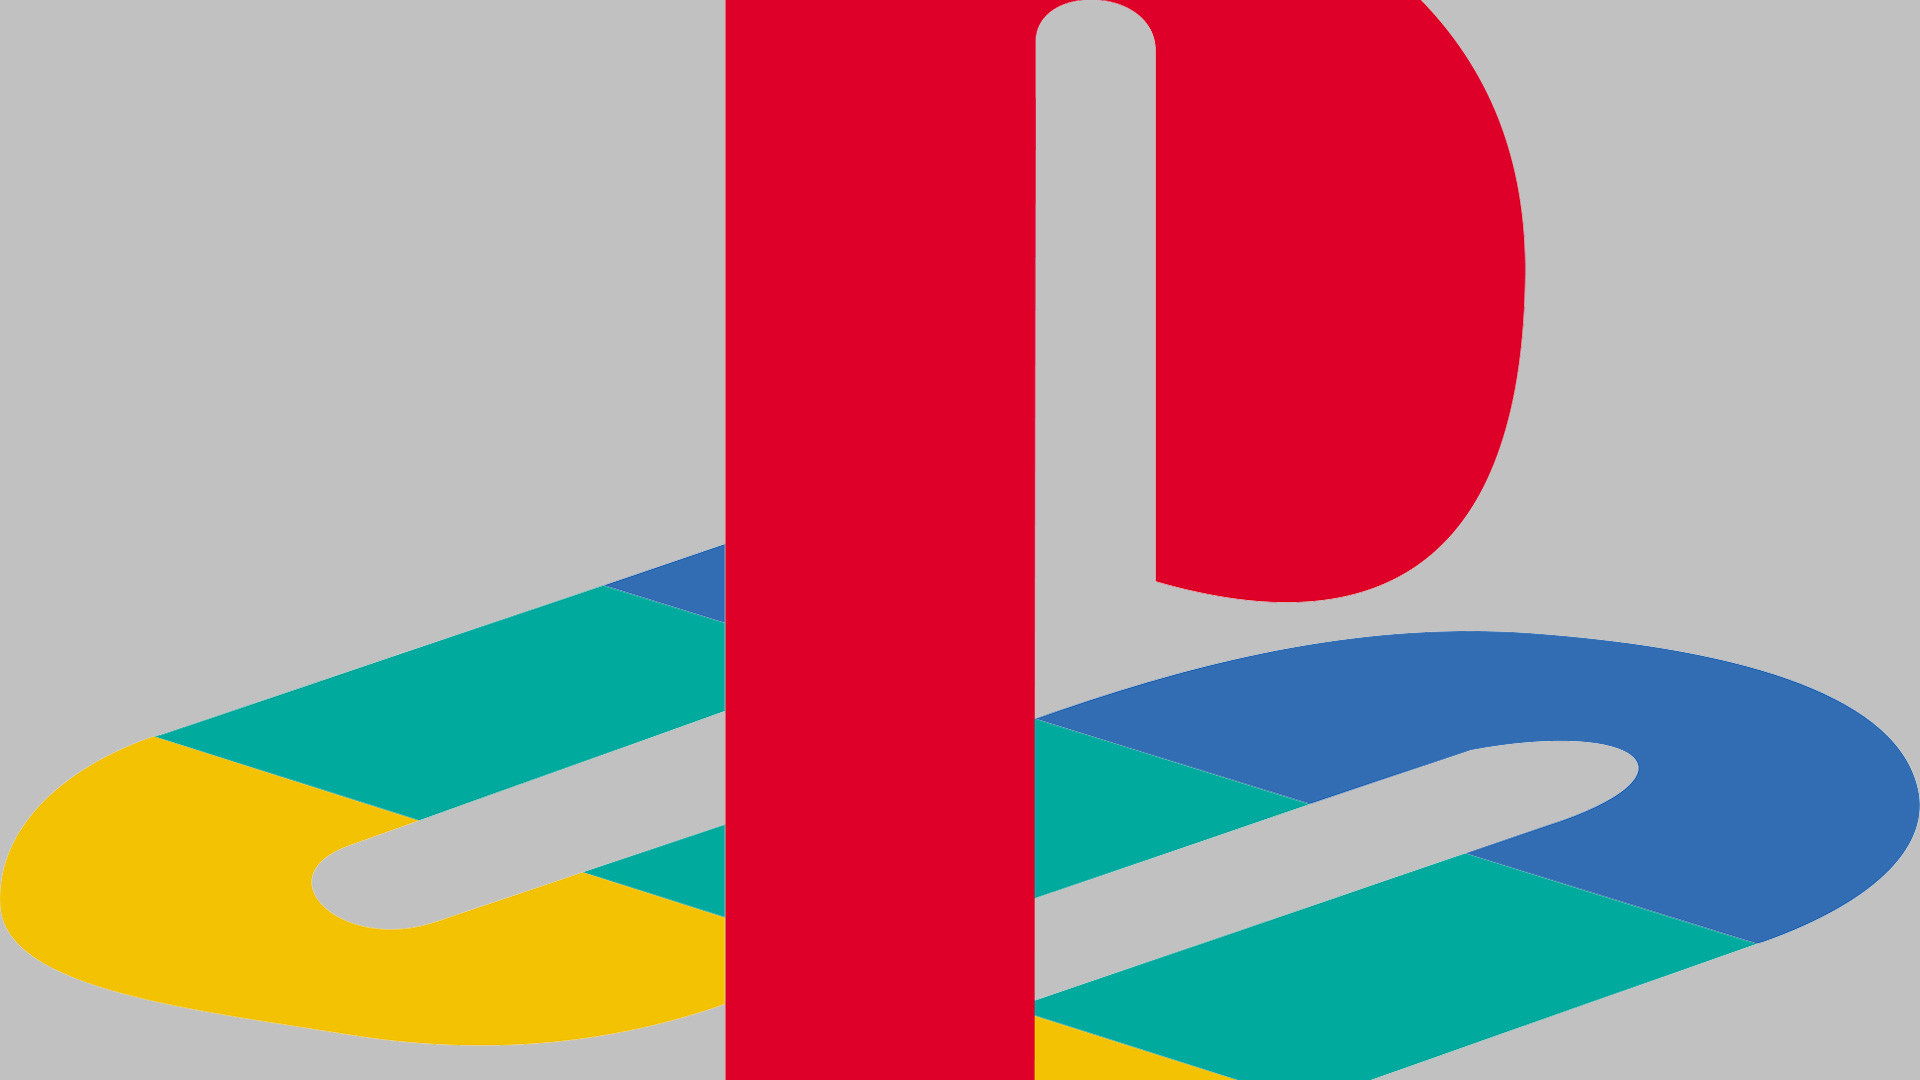 Ps4 Logo Wallpaper (87+ images)